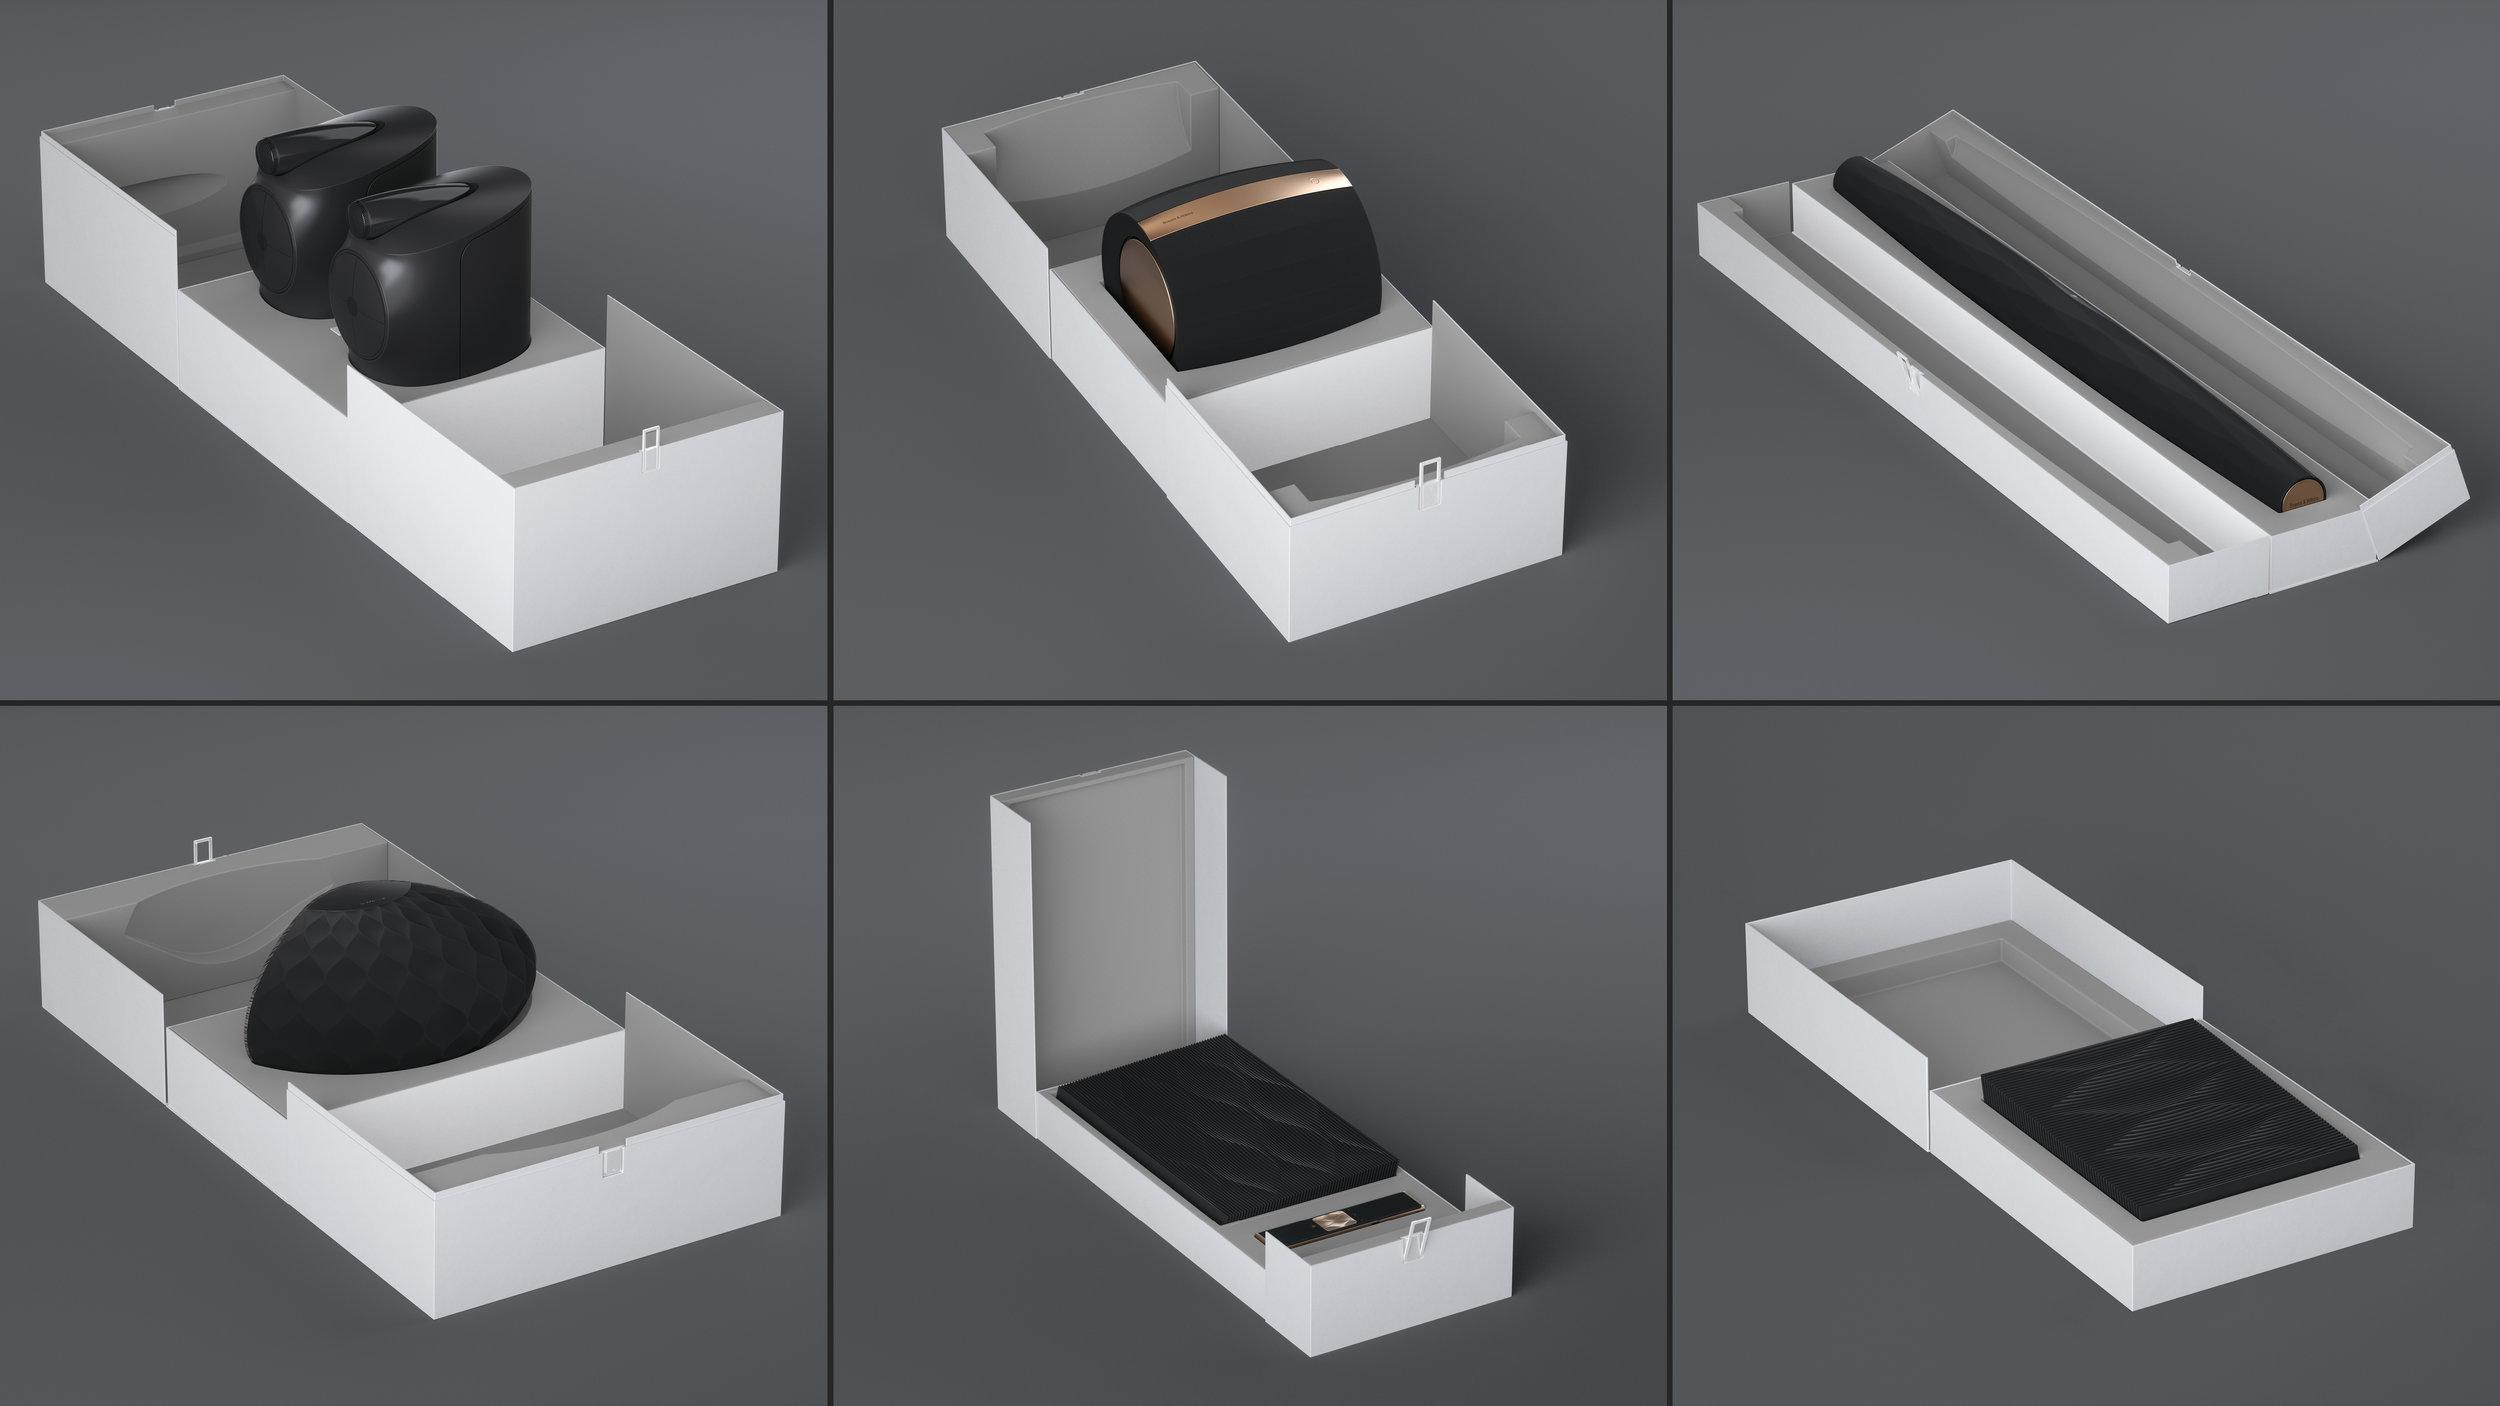 B&W_LibertySuite_PackagingStructure_R185.jpg